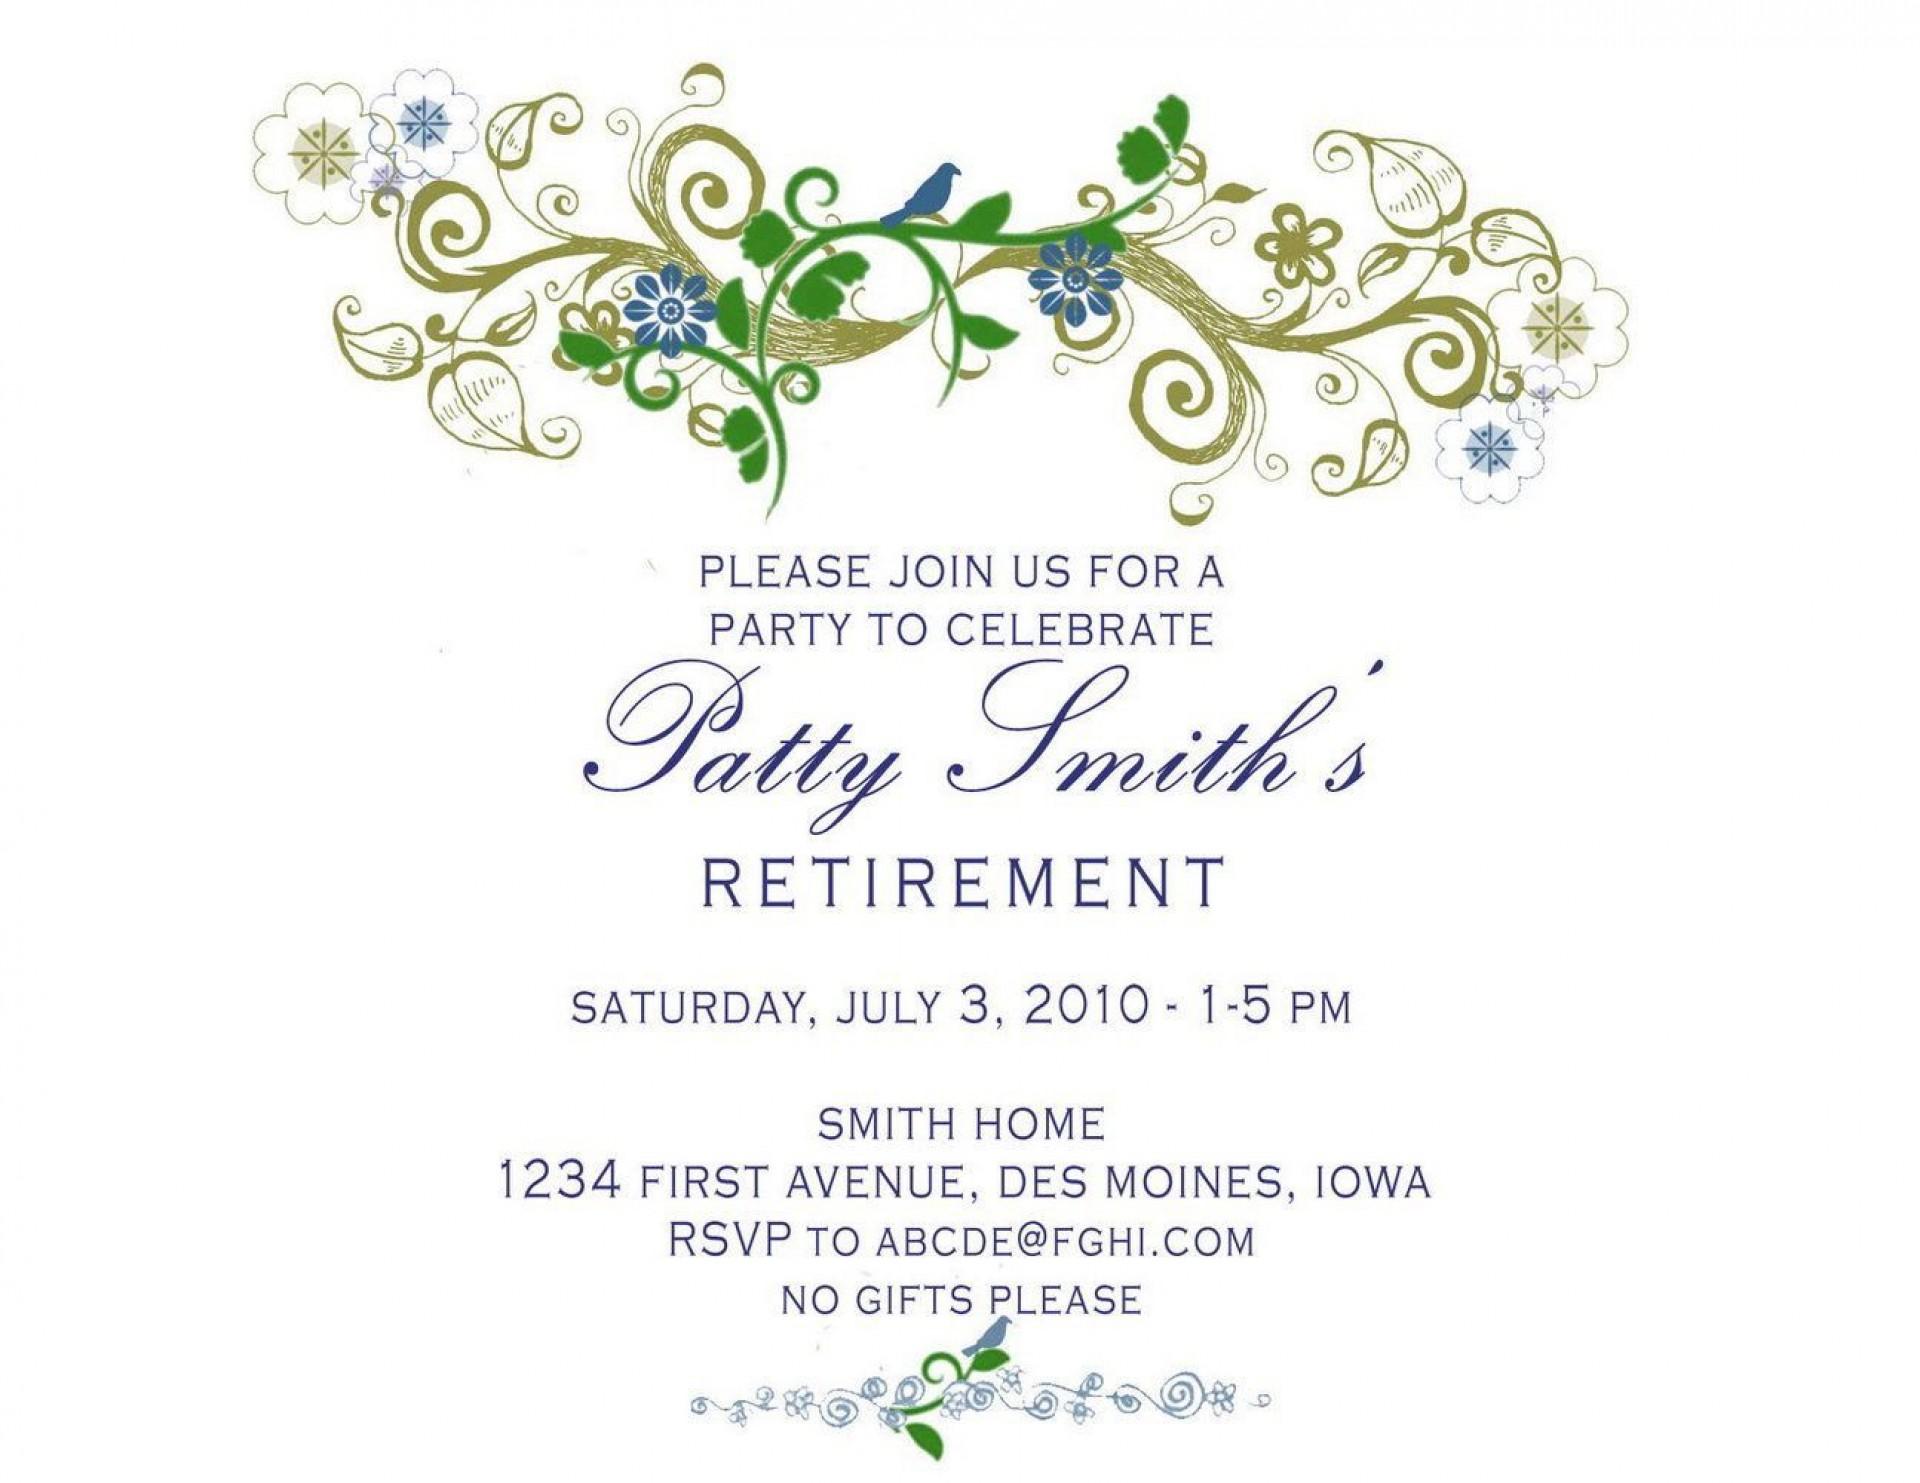 005 Sensational Retirement Party Invitation Template Photo  Templates For Free Nurse M Word1920